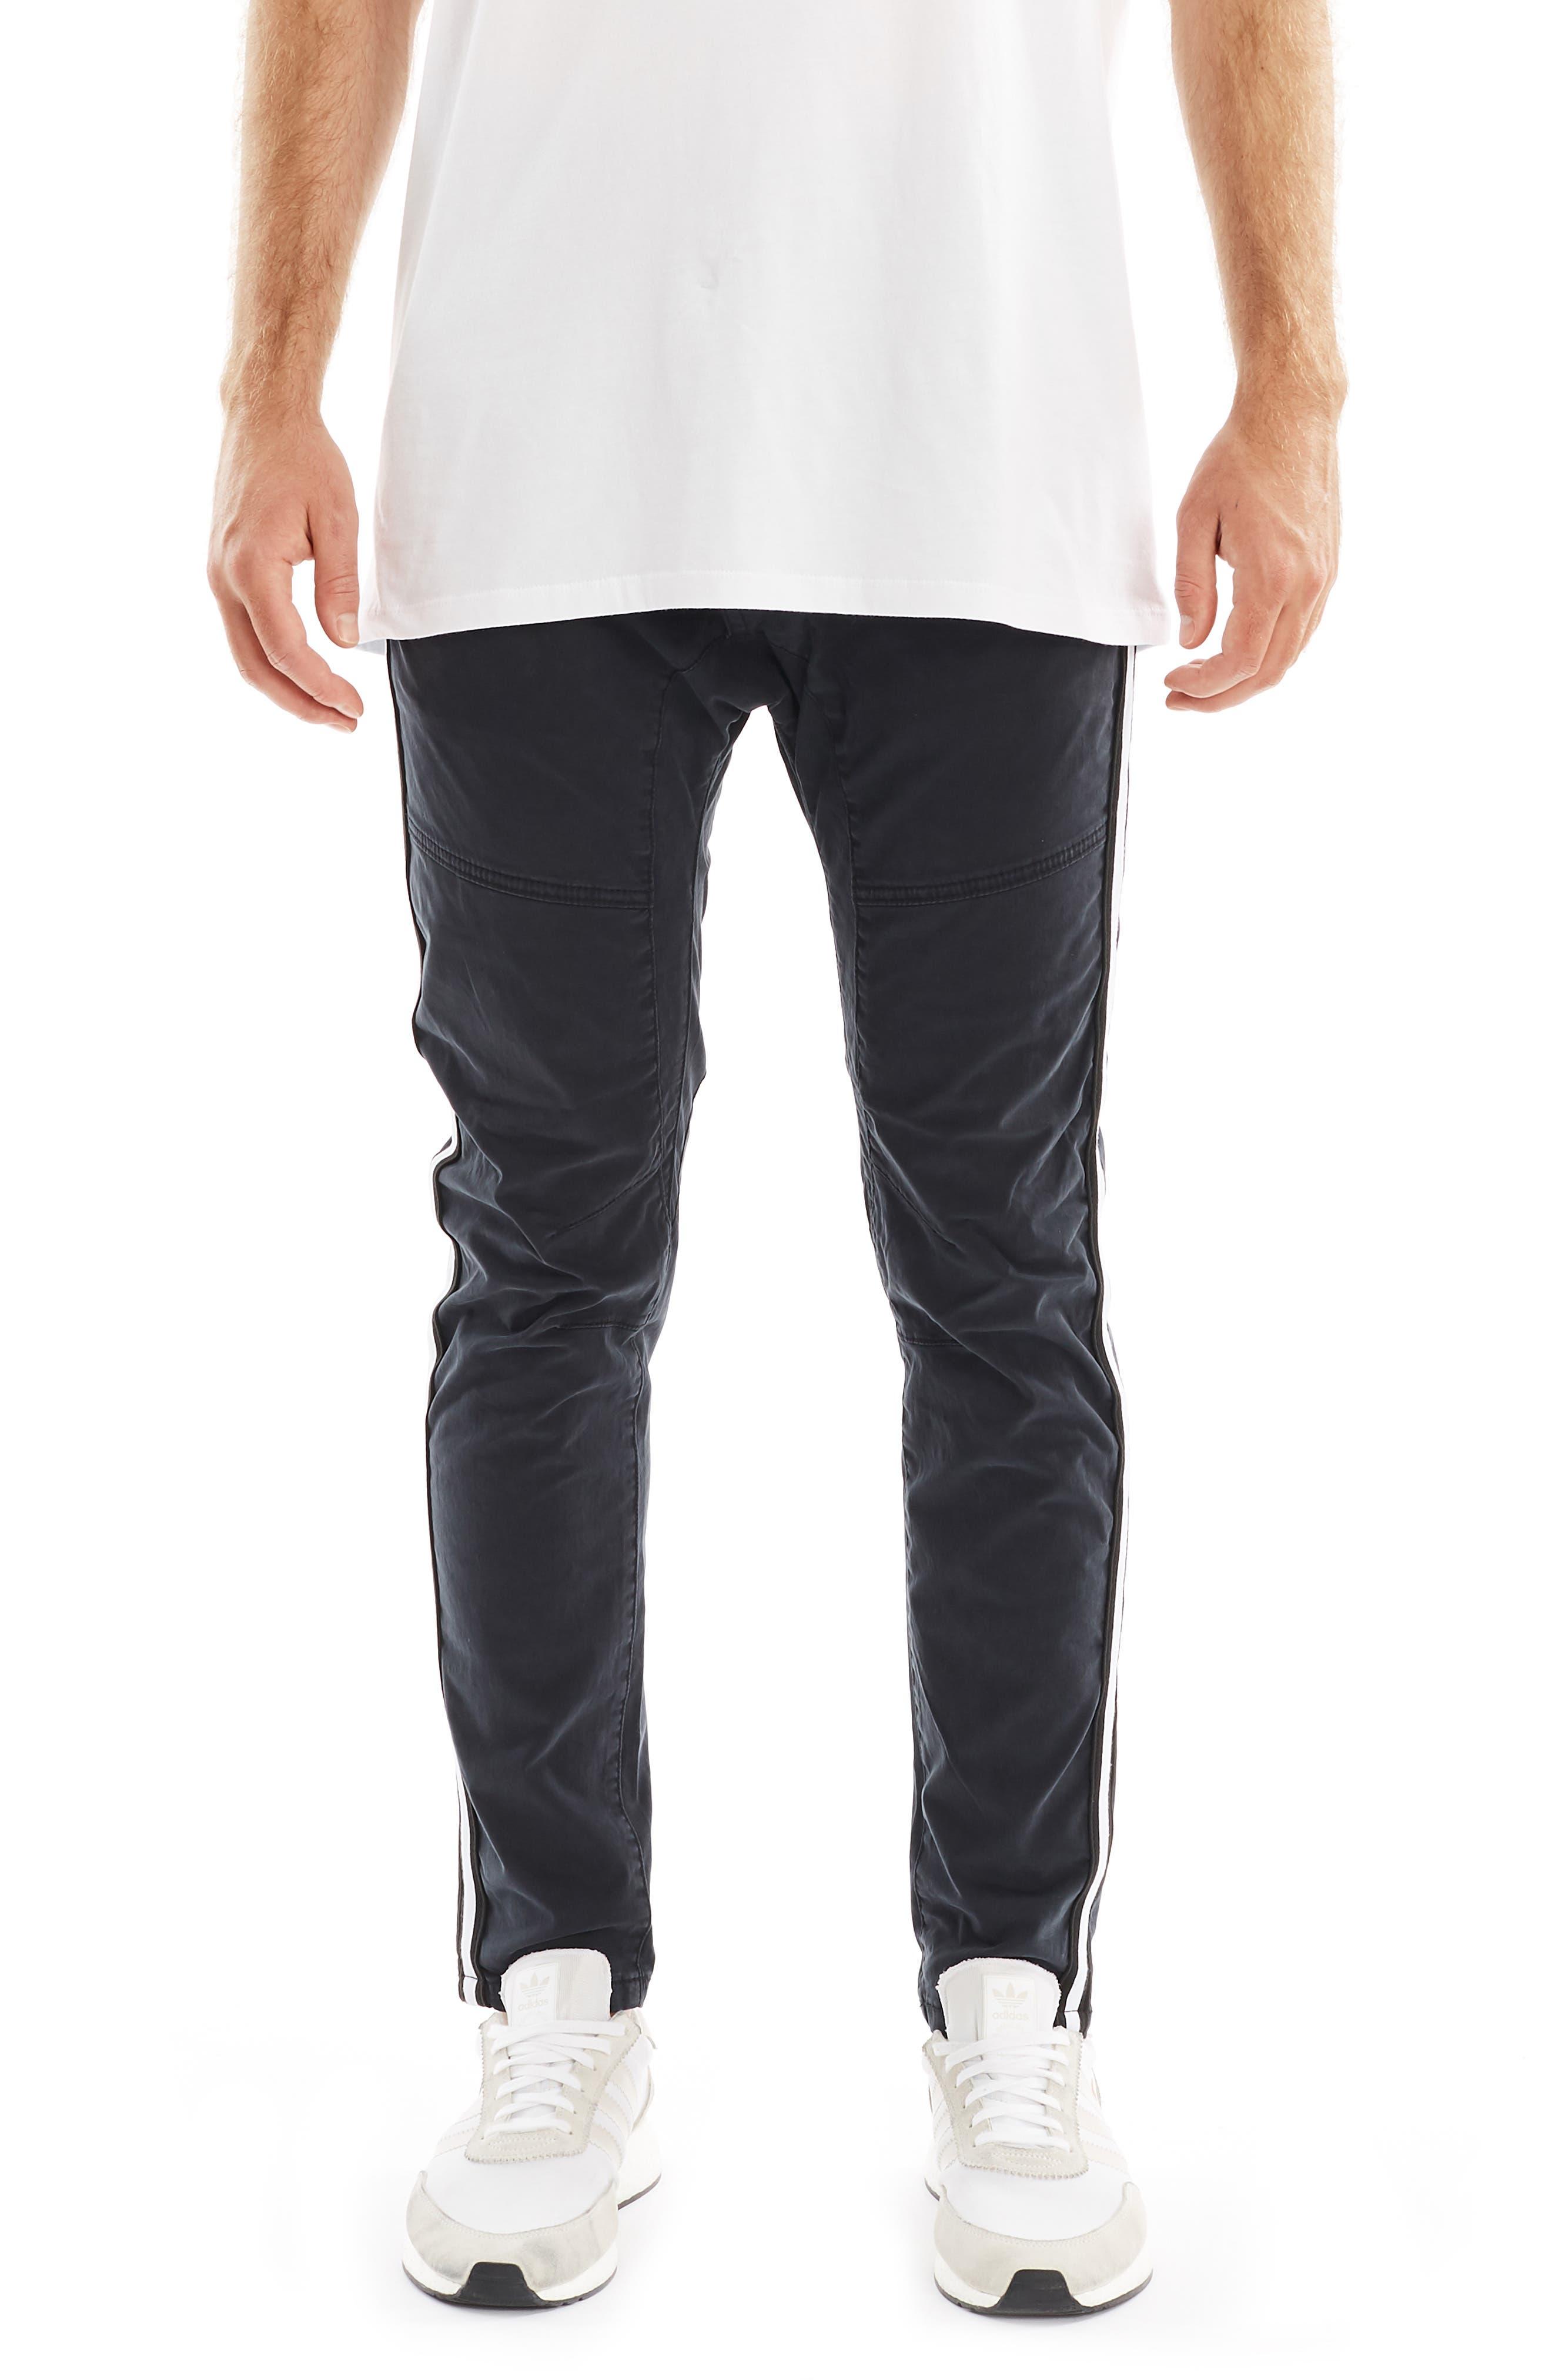 Nxp Baseline Twill Slim Fit Pants, Black